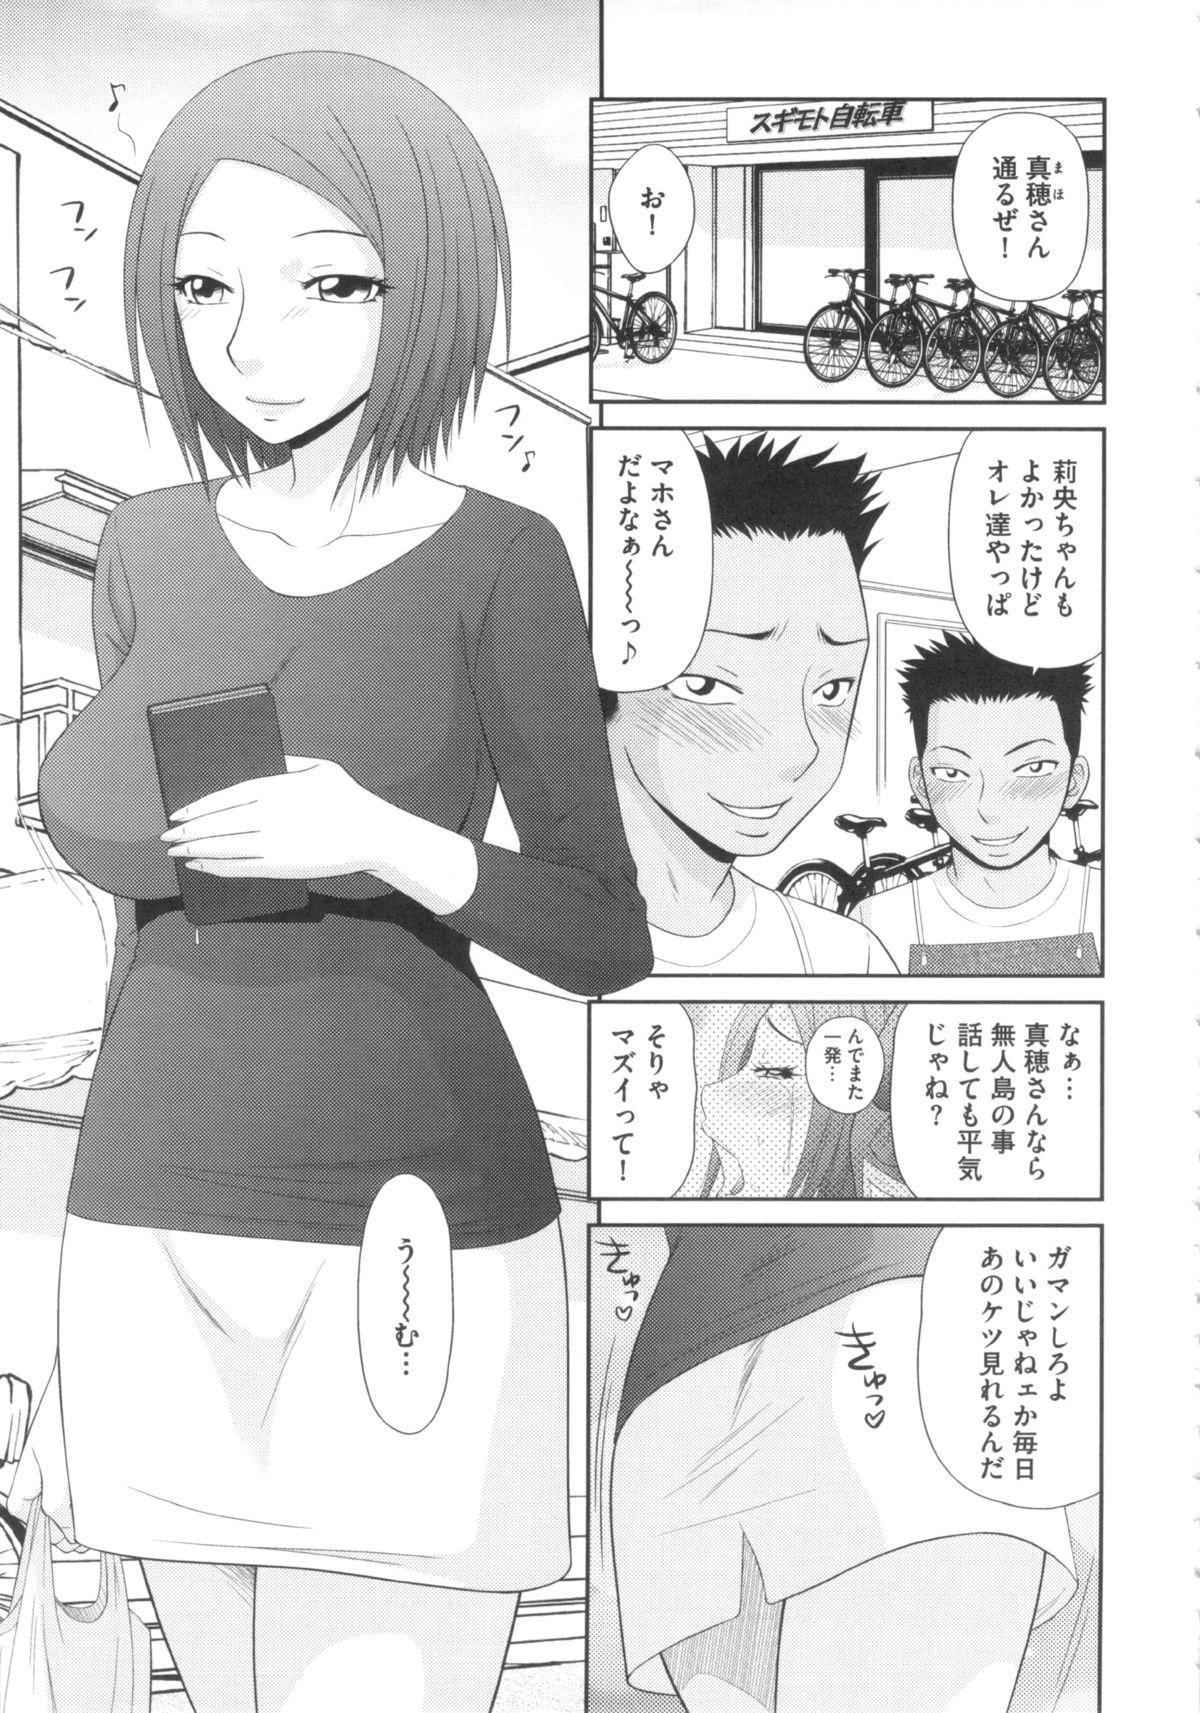 Kiseki No Zaajiru - Sperm of Miracle 145